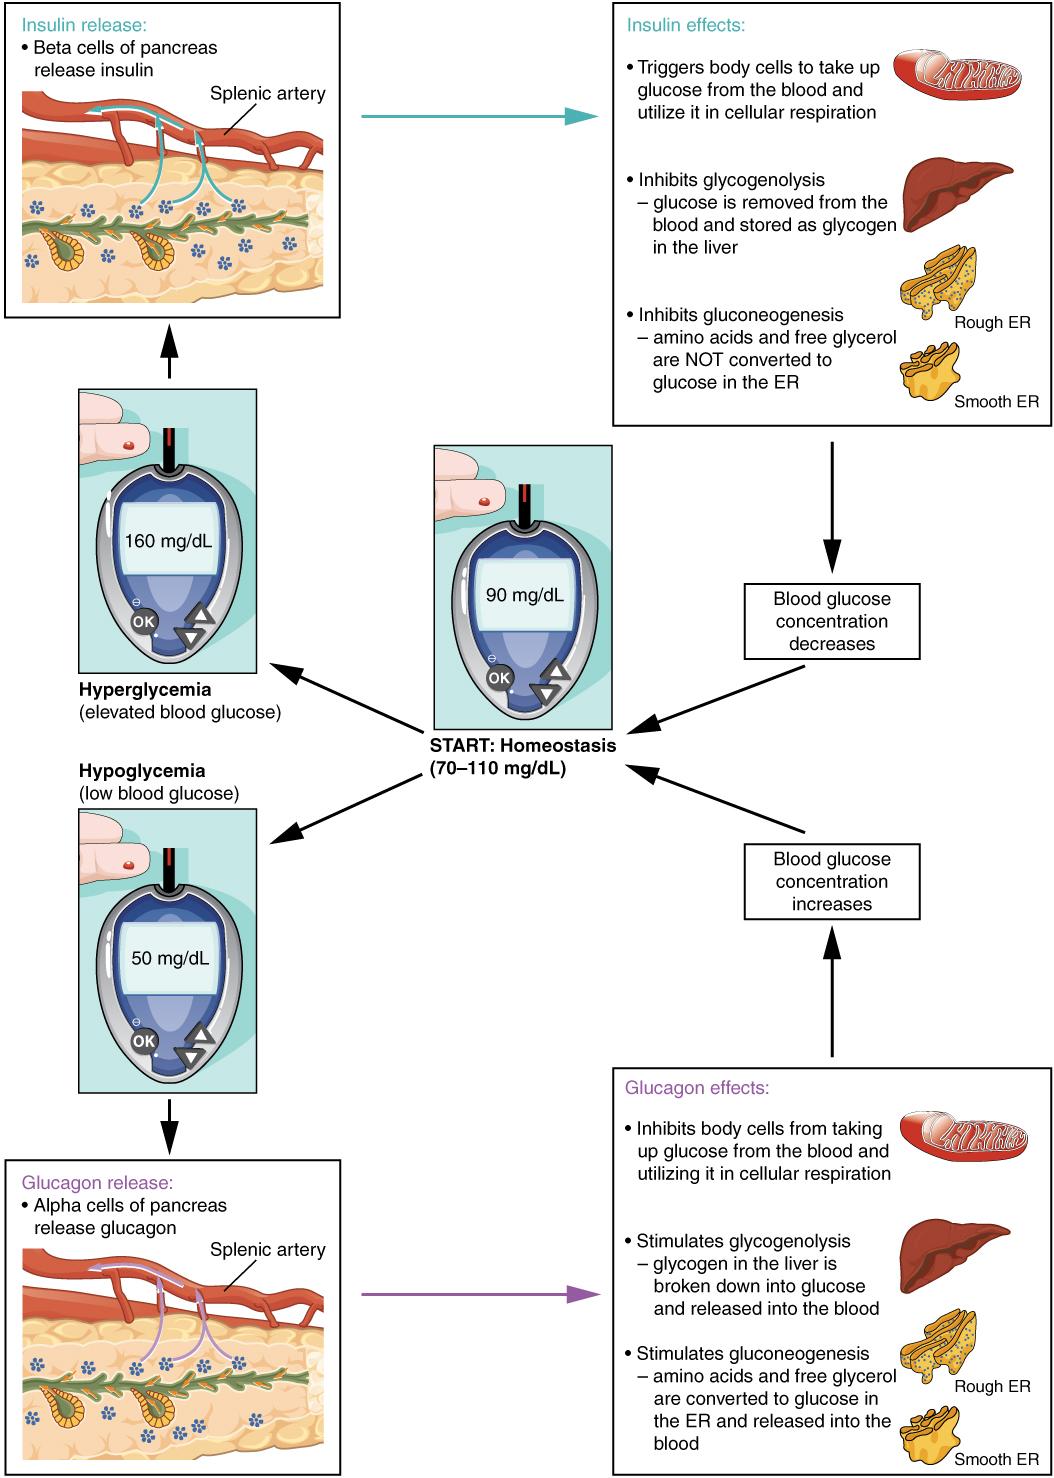 Illustration showing homeostatic regulation of blook glucose levels, with labels.